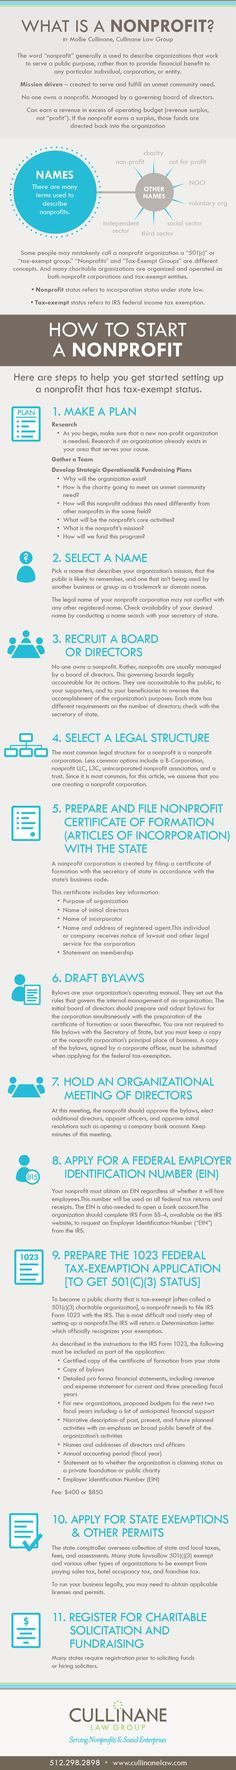 molliecullinane-How to start a nonprofit http://cullinanelaw.com/nonprofit-law-basics-how-do-i-form-a-501c3-nonprofit-corporation/#.U2lDJxZaorw